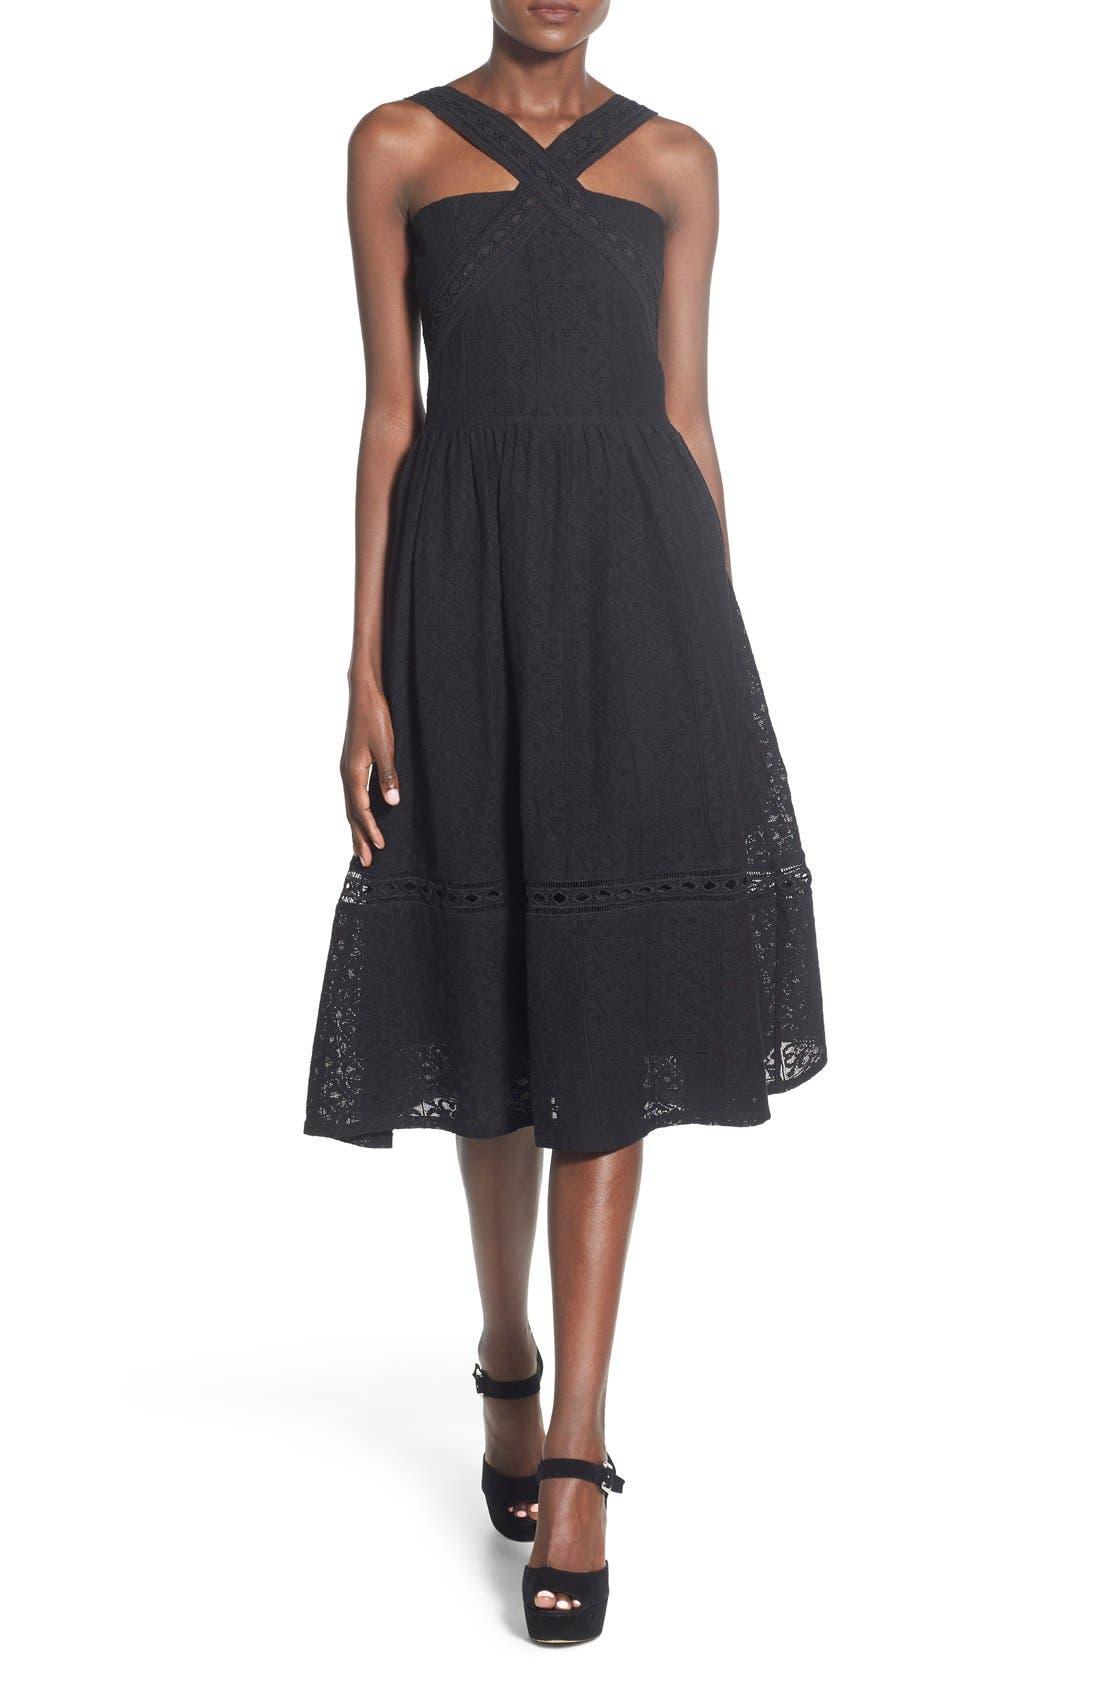 Alternate Image 1 Selected - J.O.A. Lace Fit & Flare Midi Dress